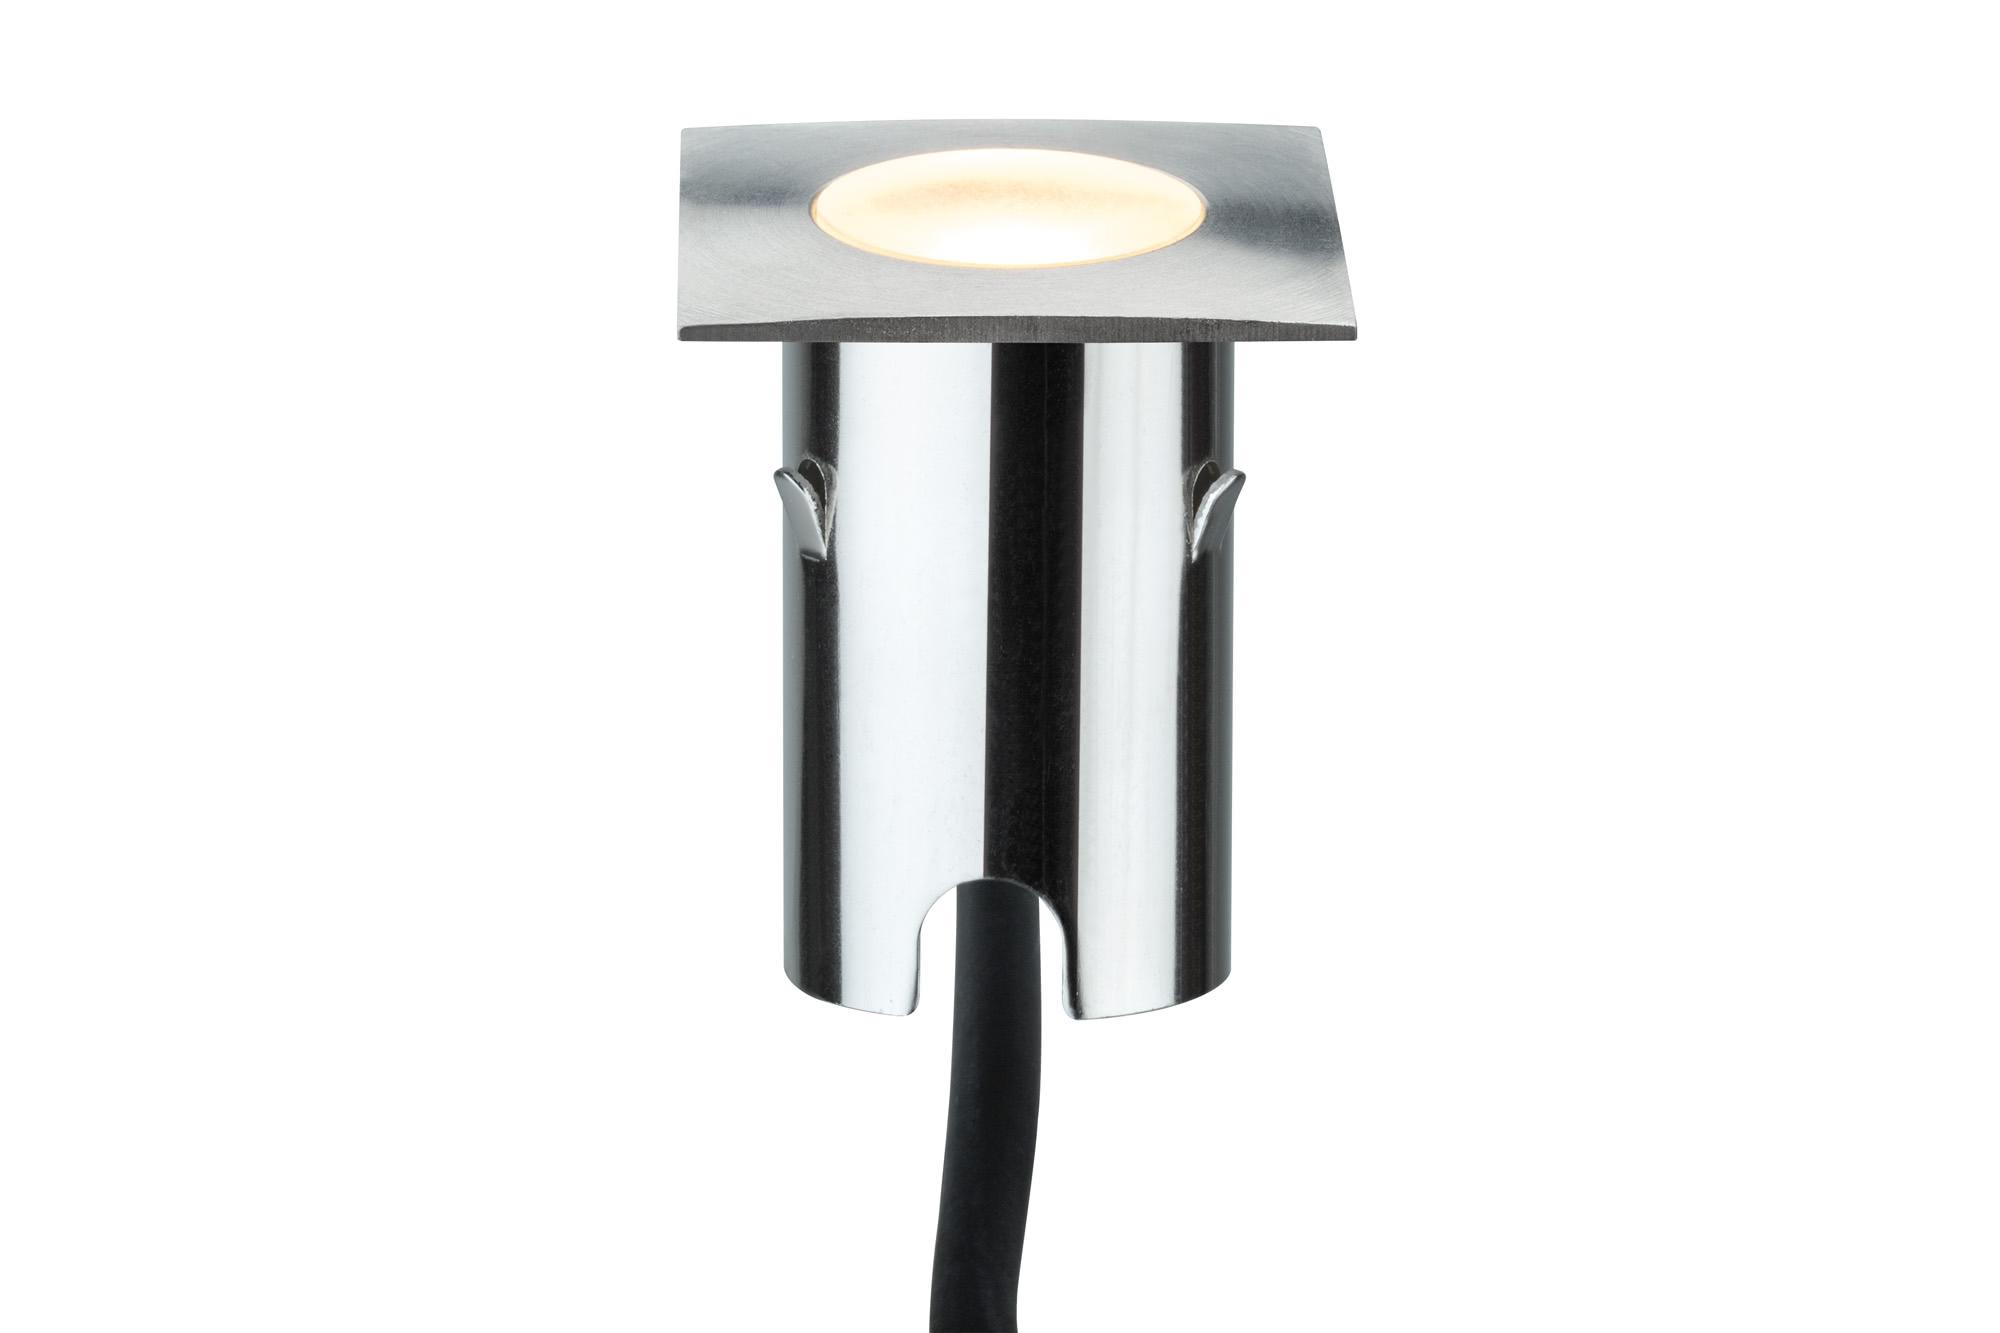 Paulmann. 93786 Набор светильников MiniBoden EBL eckig IP67 Basis 4x1W Est